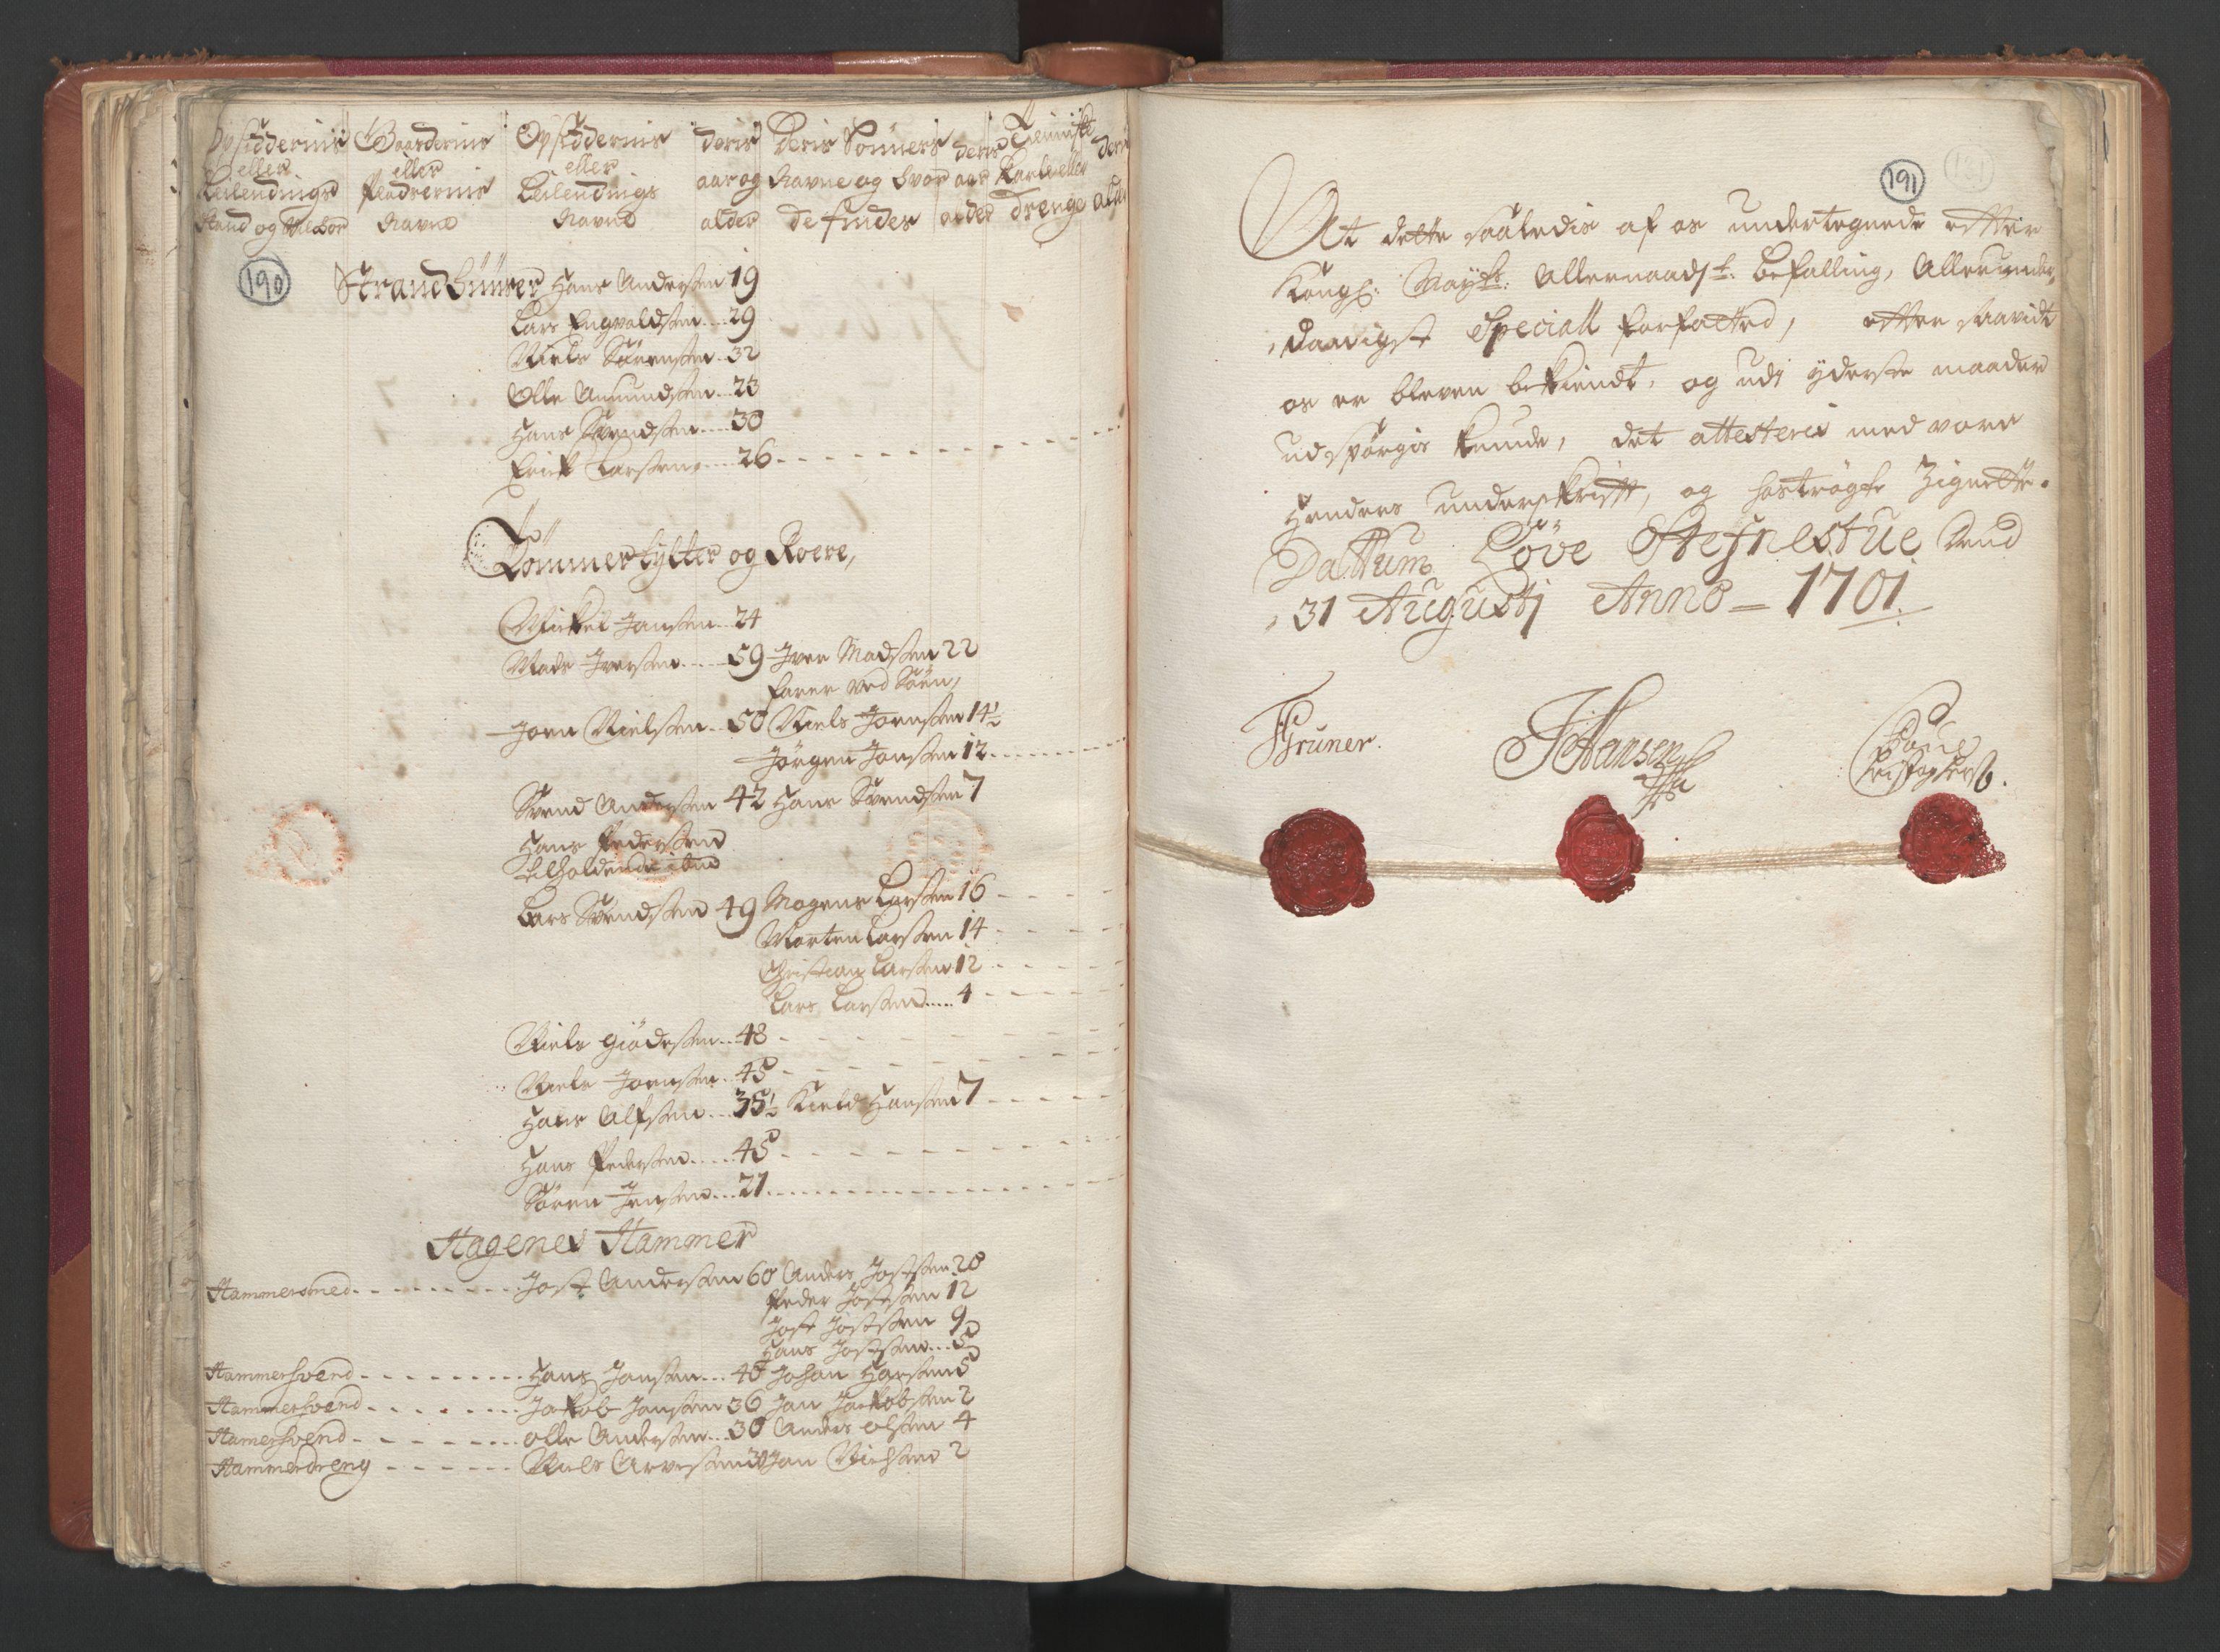 RA, Manntallet 1701, nr. 2: Solør, Odal og Østerdal fogderi og Larvik grevskap, 1701, s. 190-191